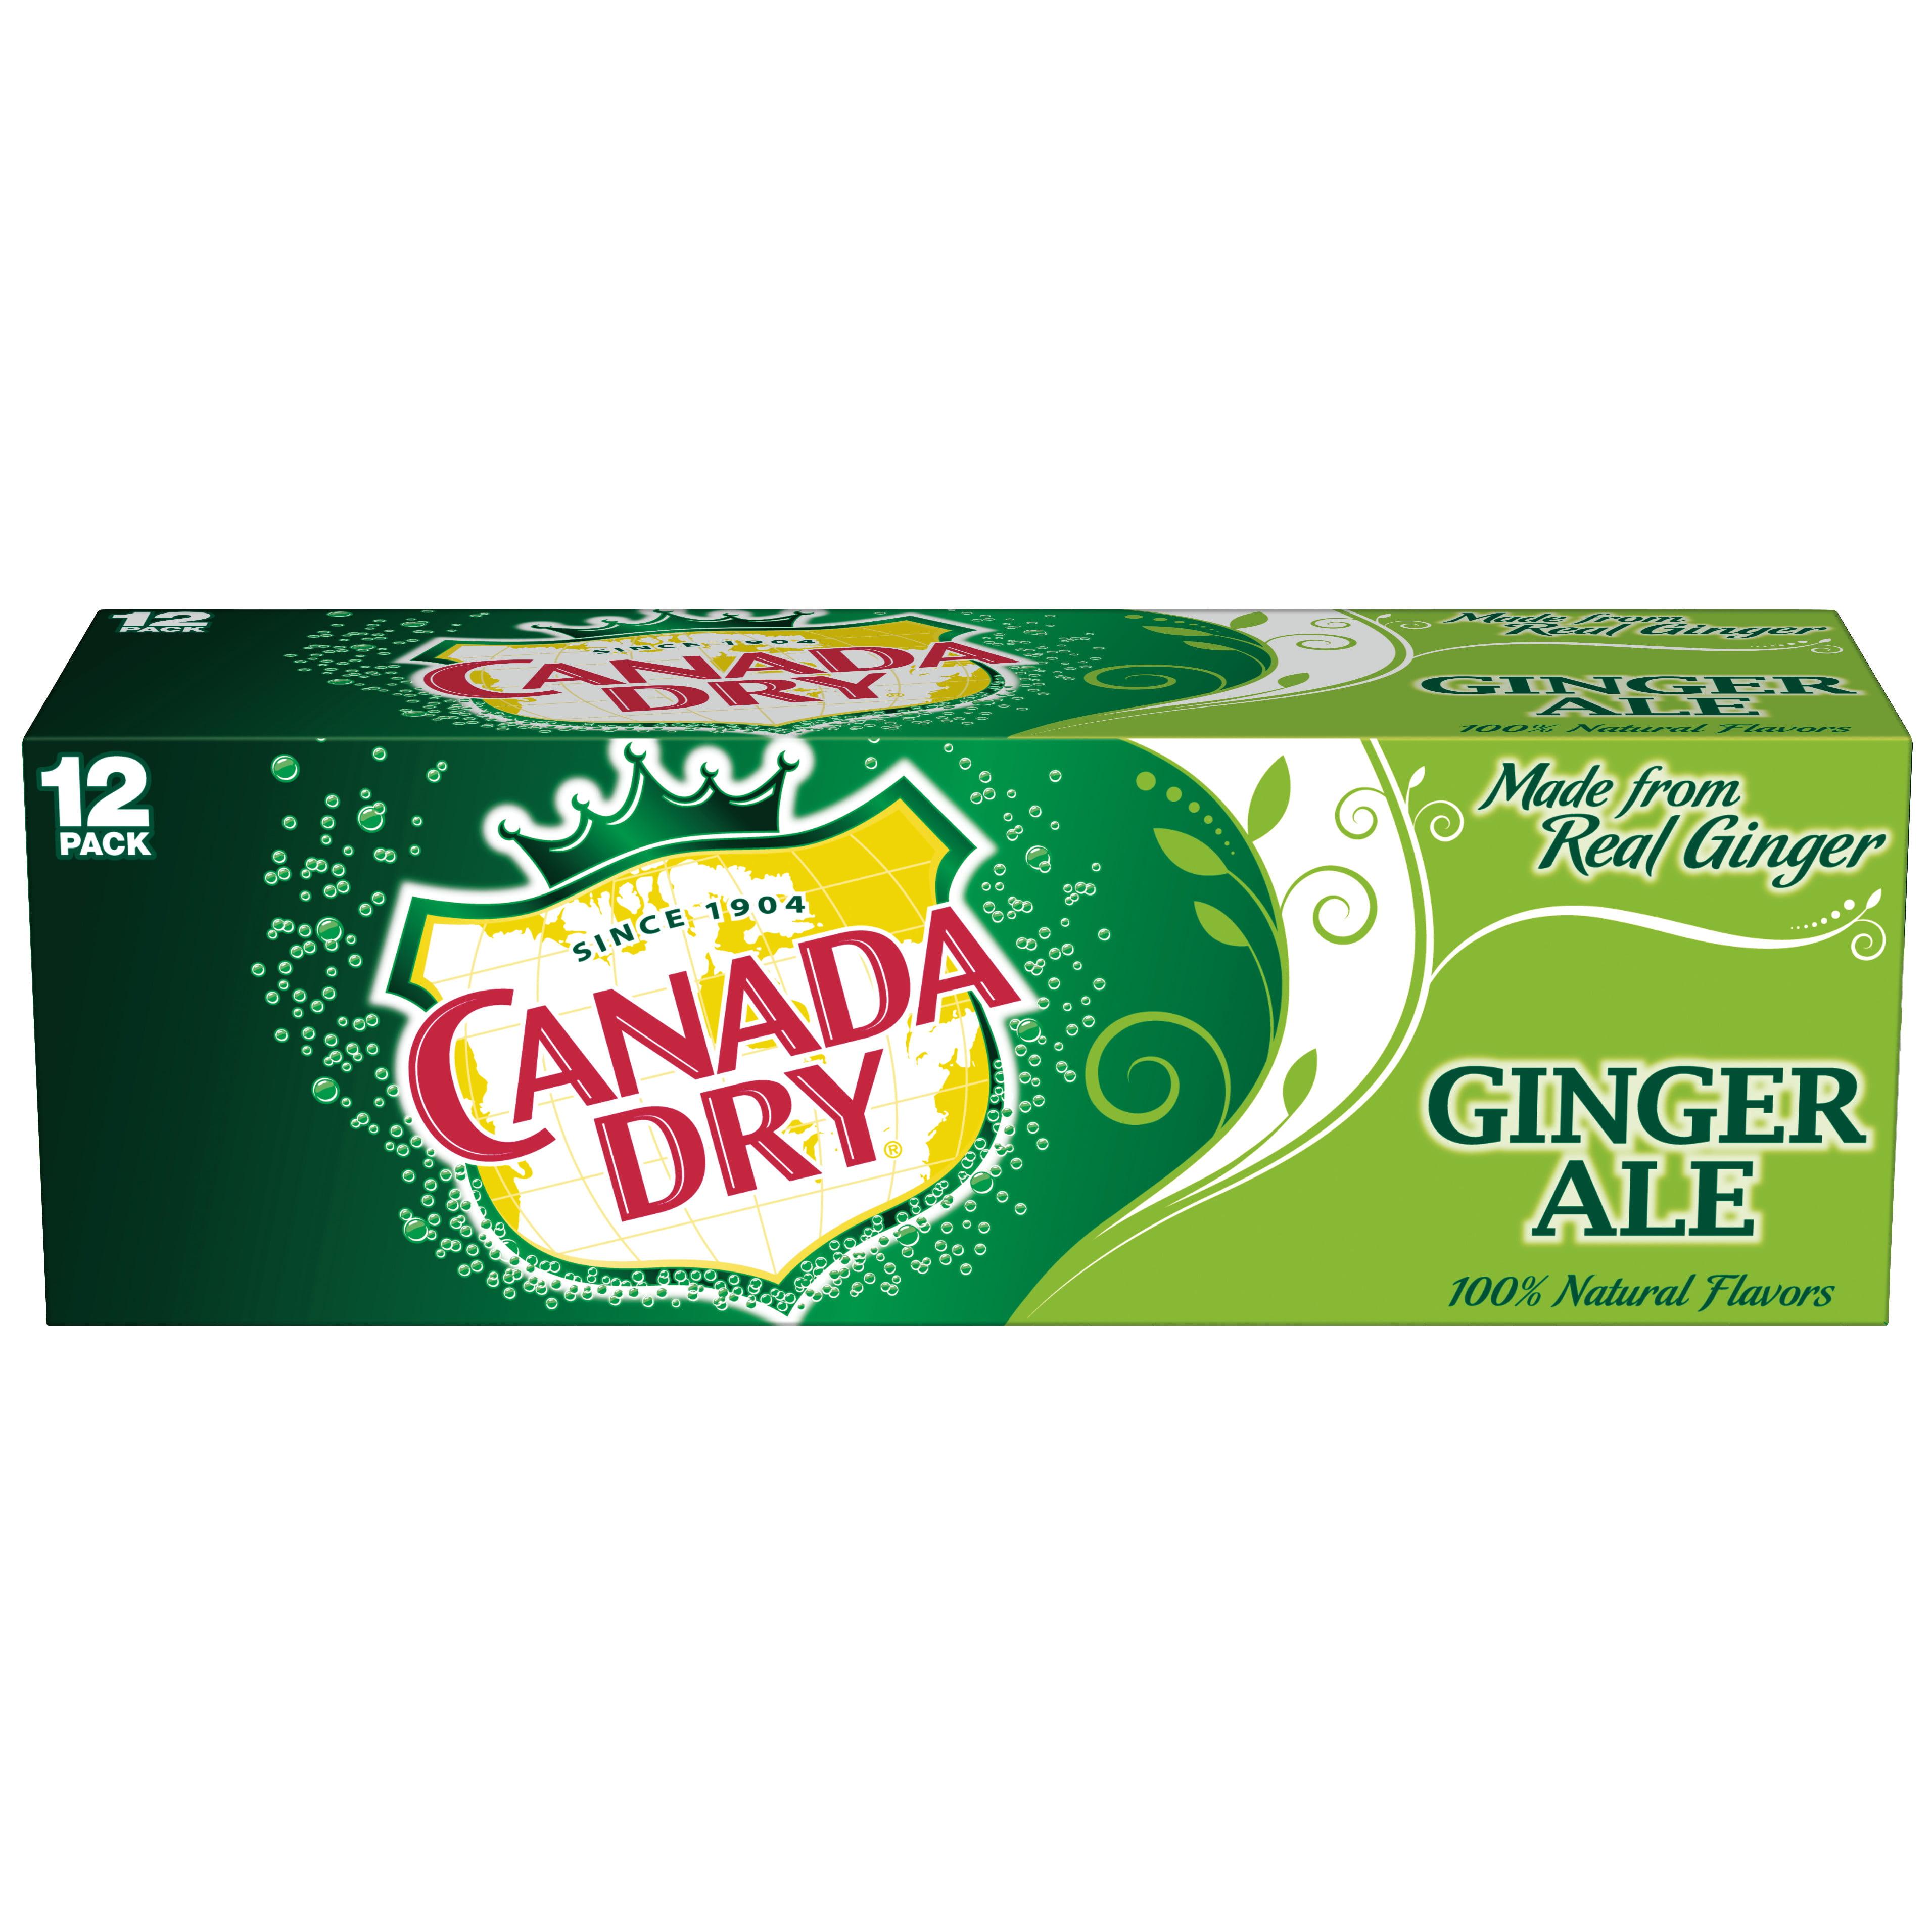 Canada Dry Ginger Ale, 12 fl oz, 12 pack